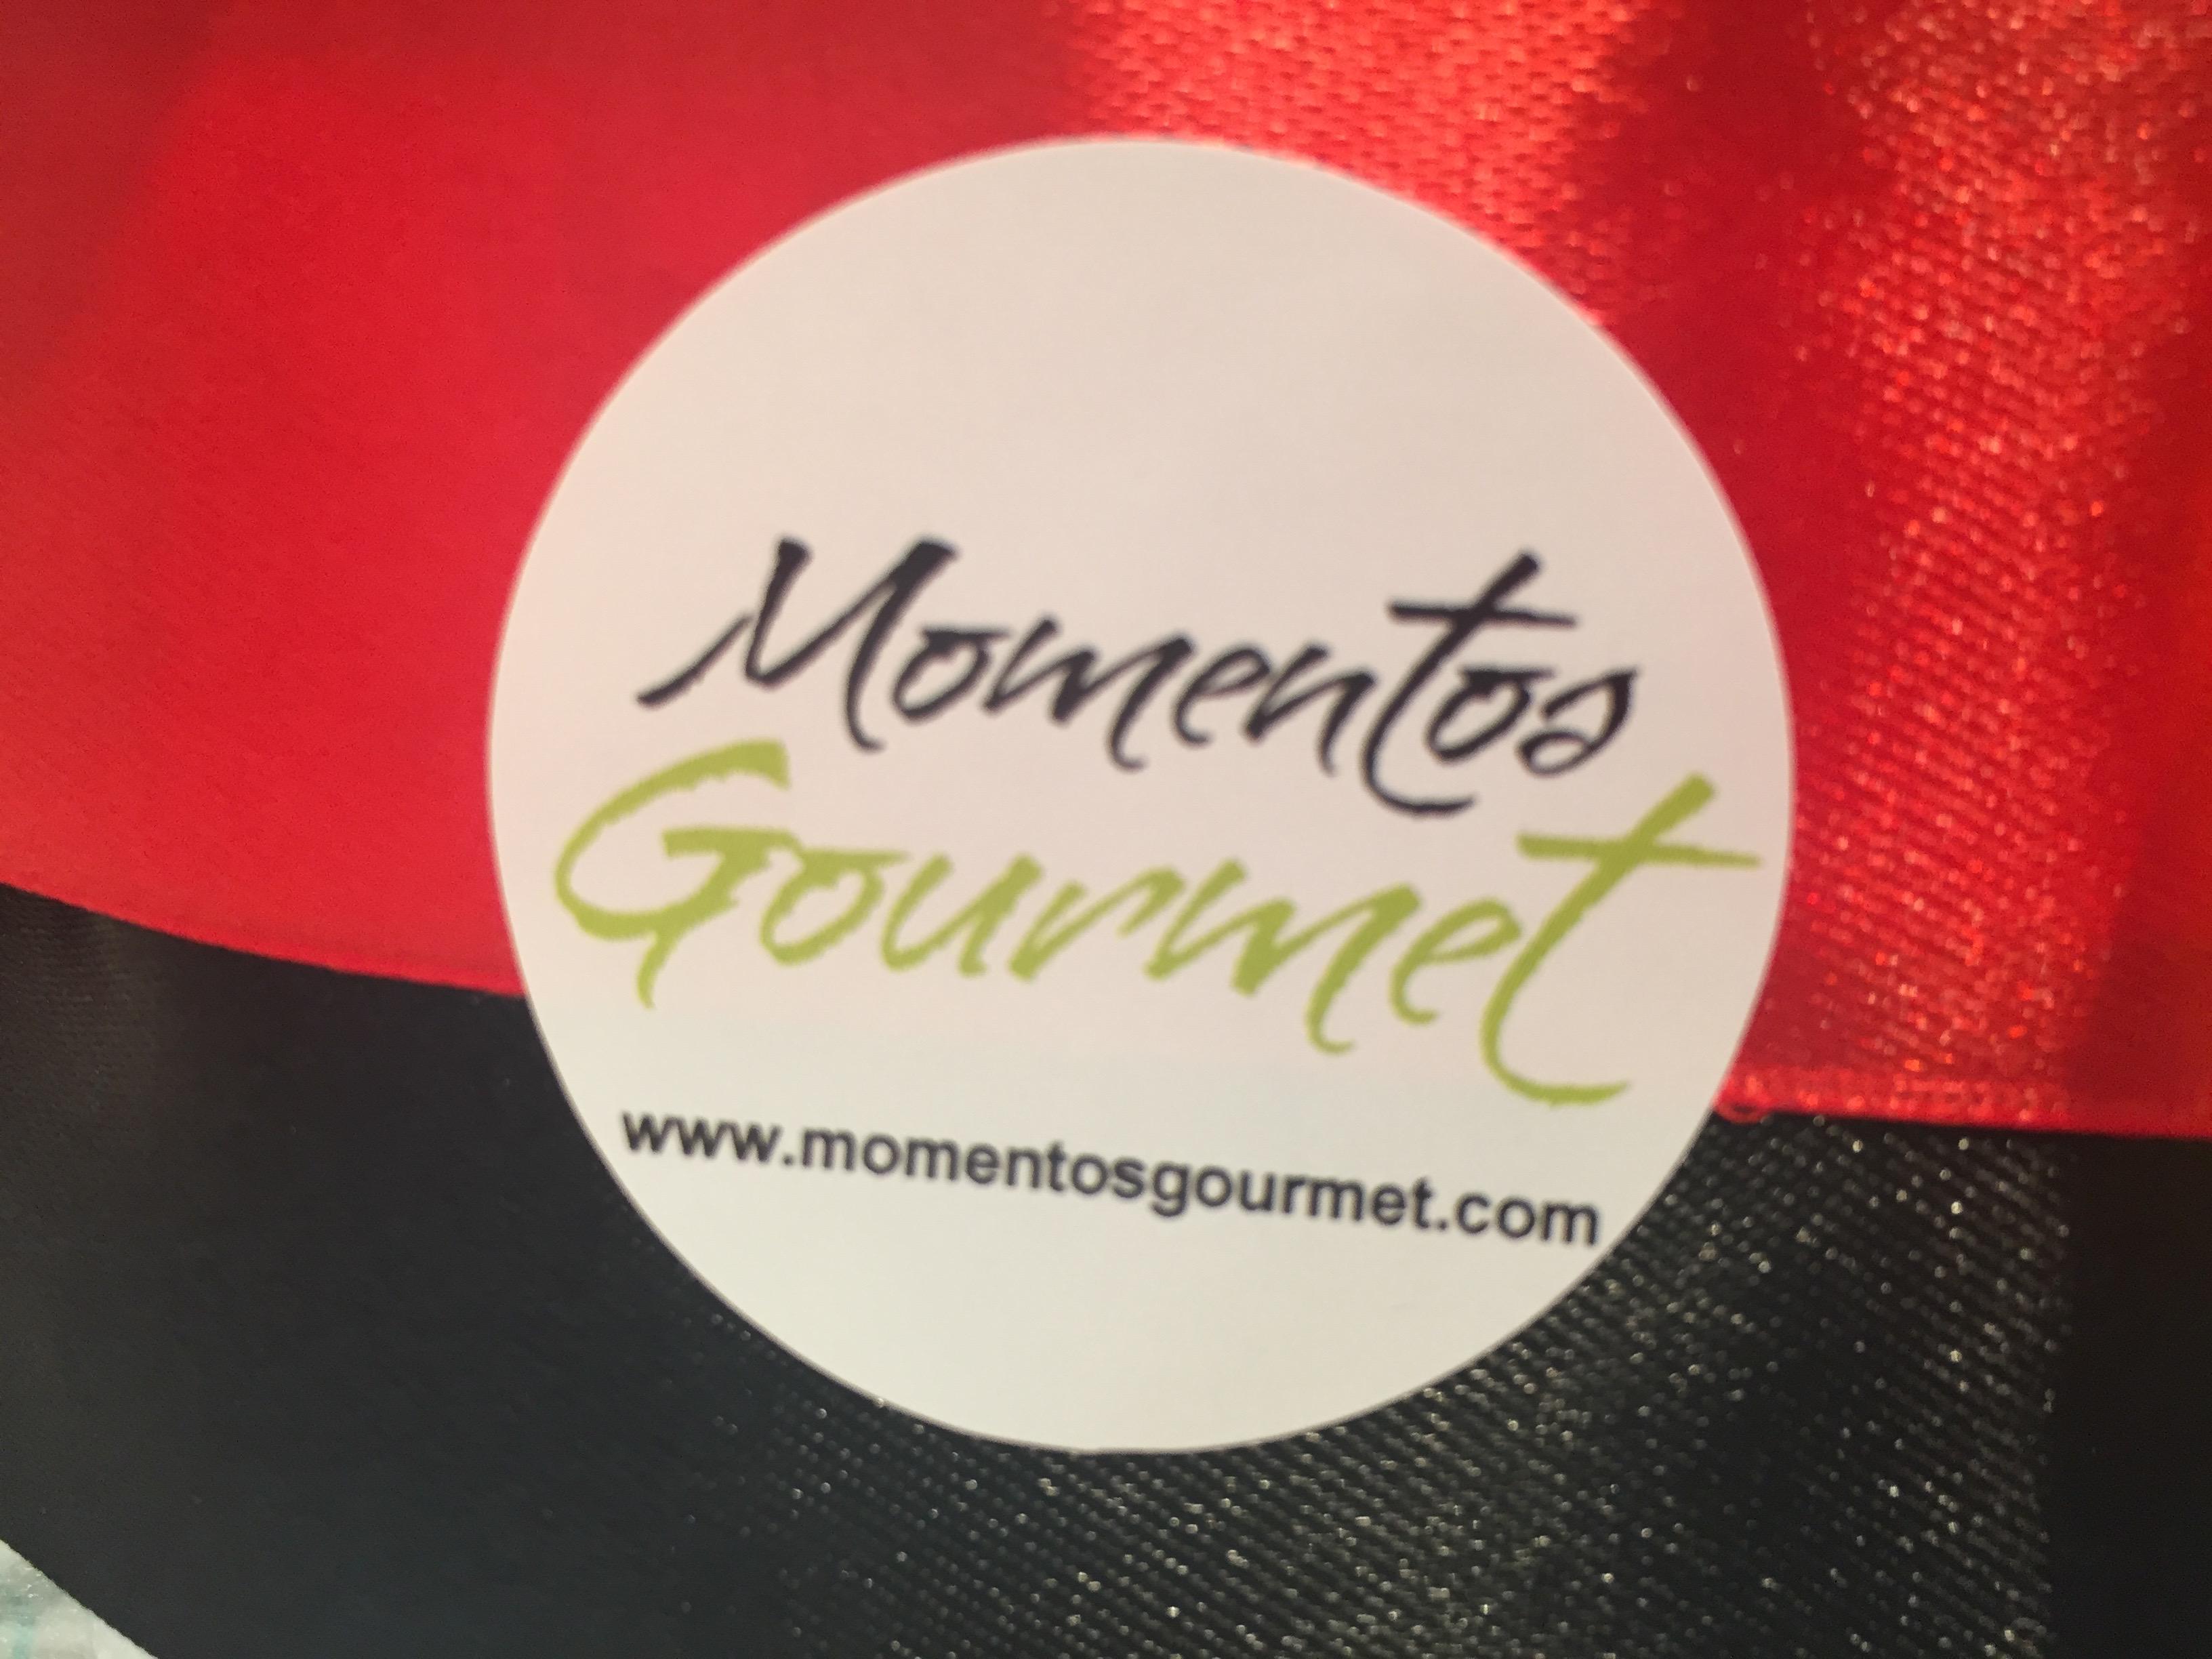 Logo-MomentosGourmet-rojo-negro